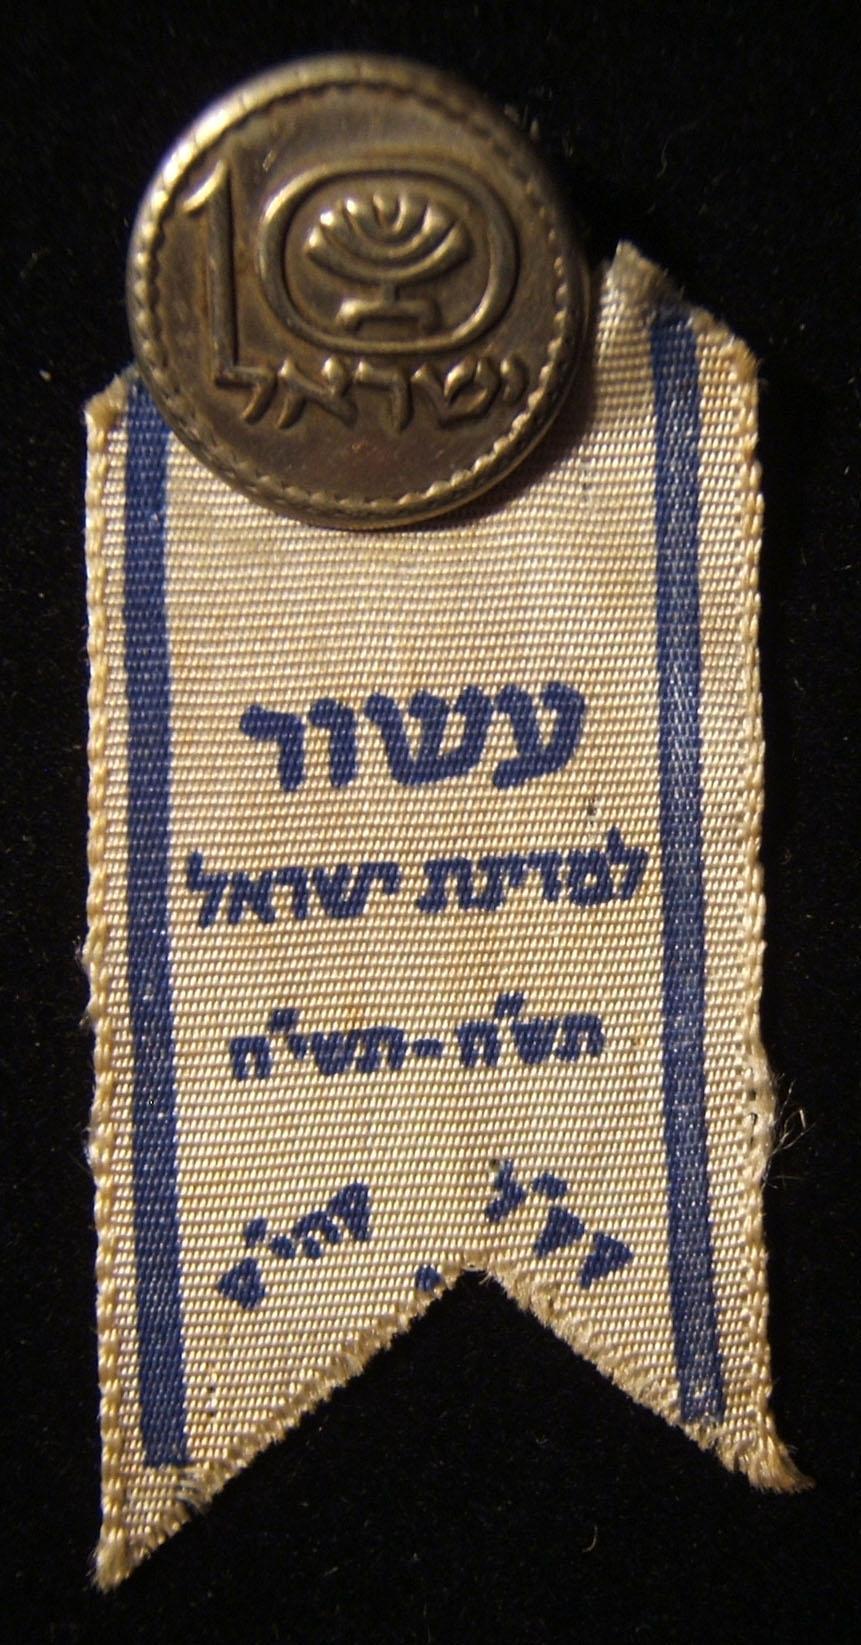 Israel: Pin commemorating Israel's 10th Anniversary with ribbon reading